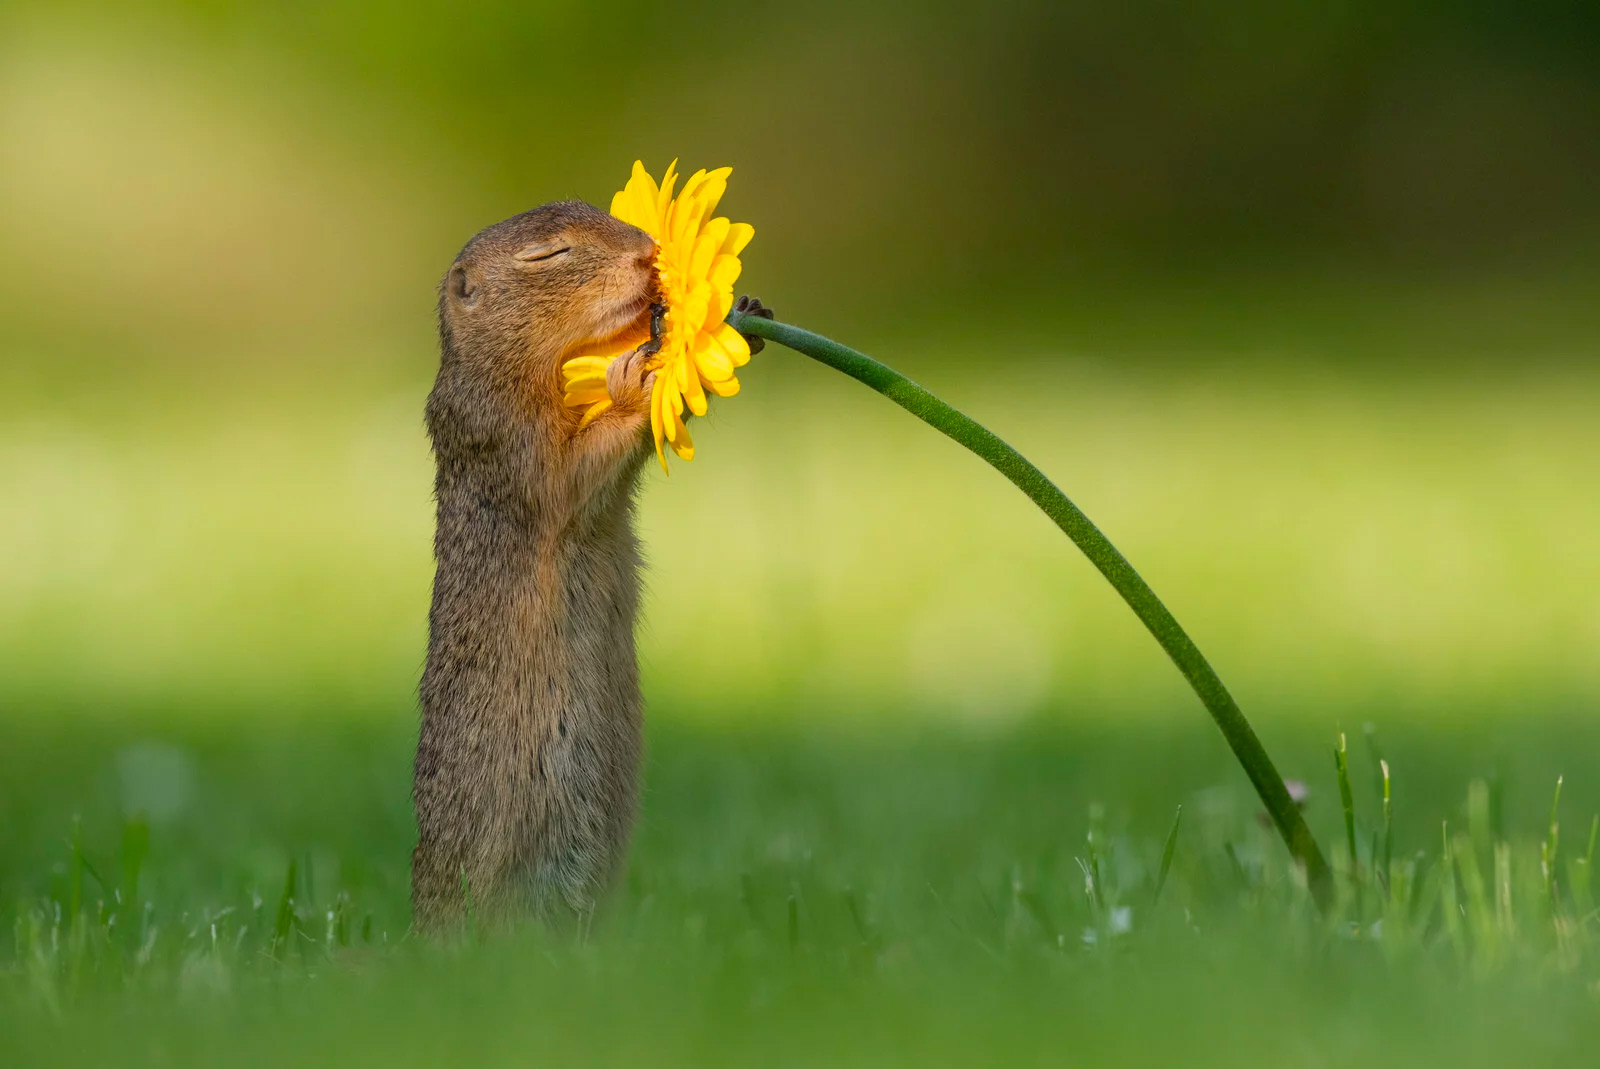 squirrel-4.jpg